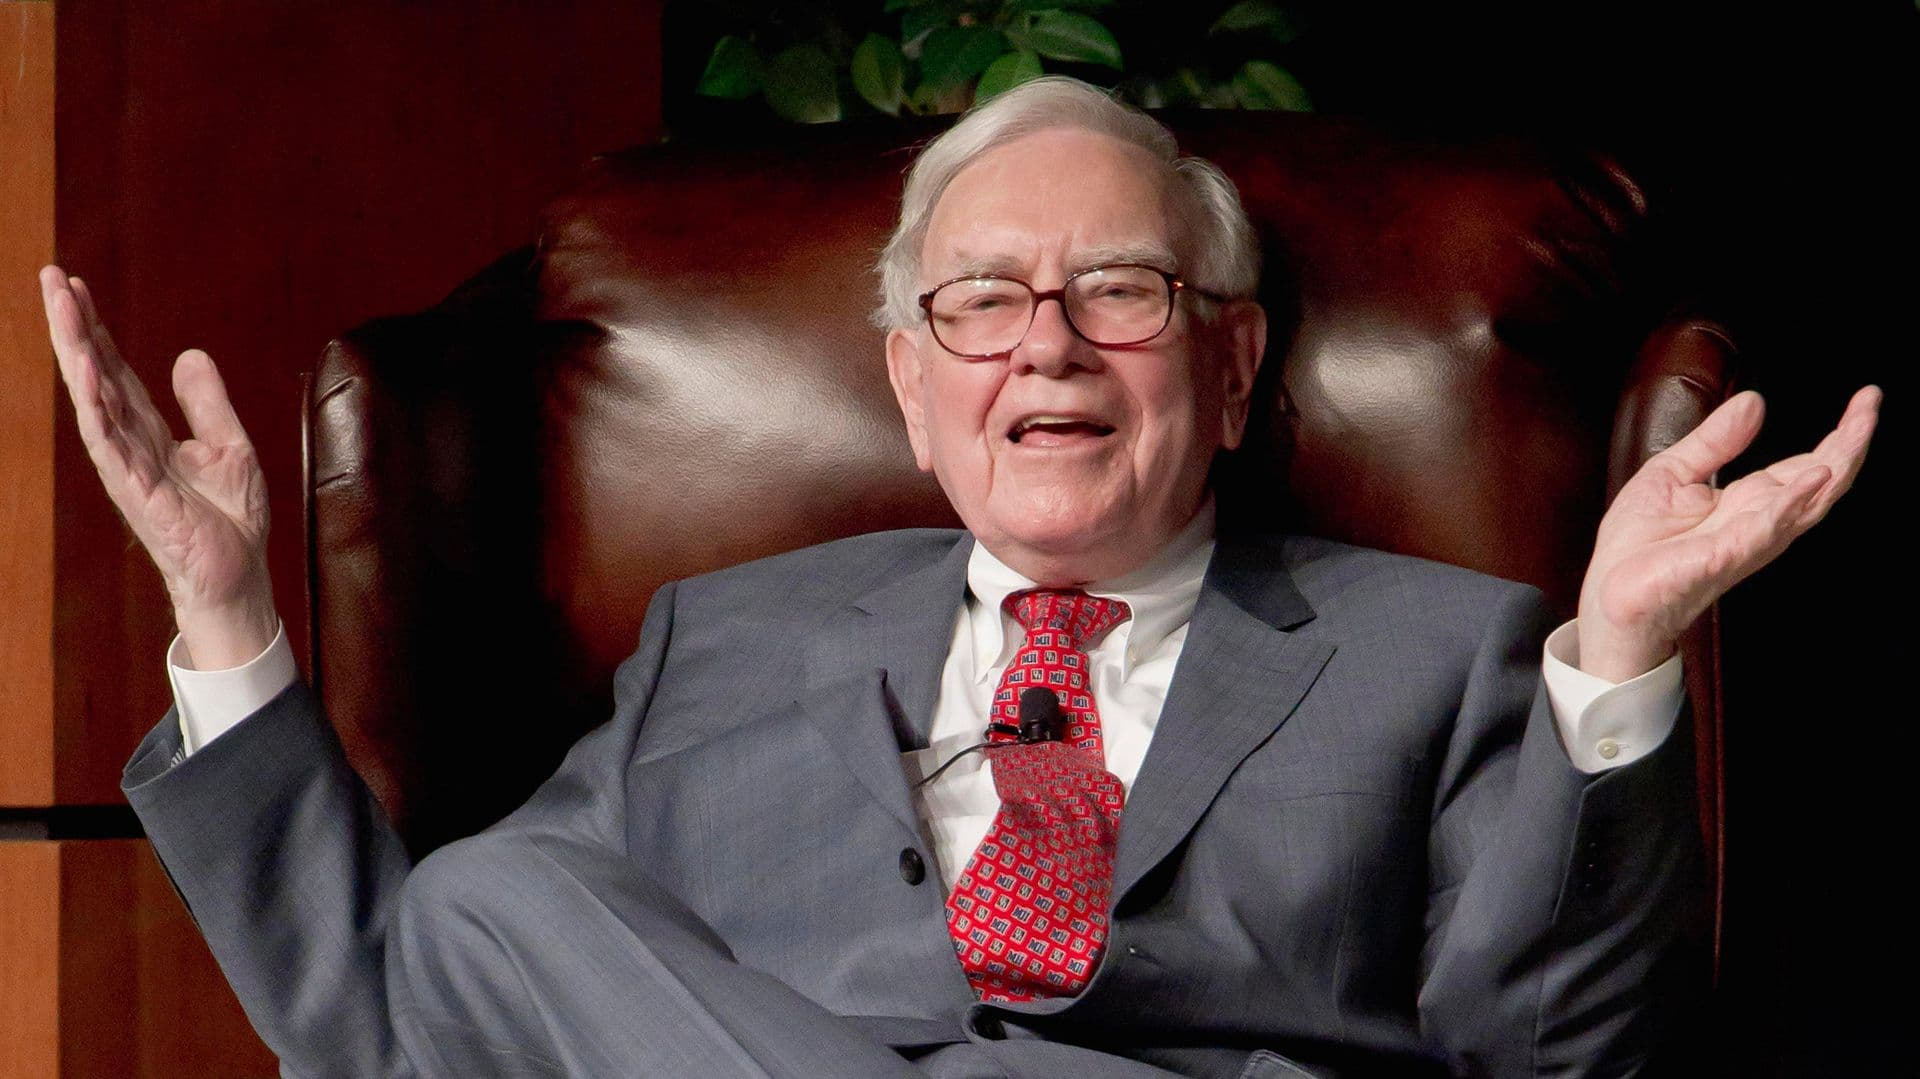 6 Stocks Warren Buffett Just Bought